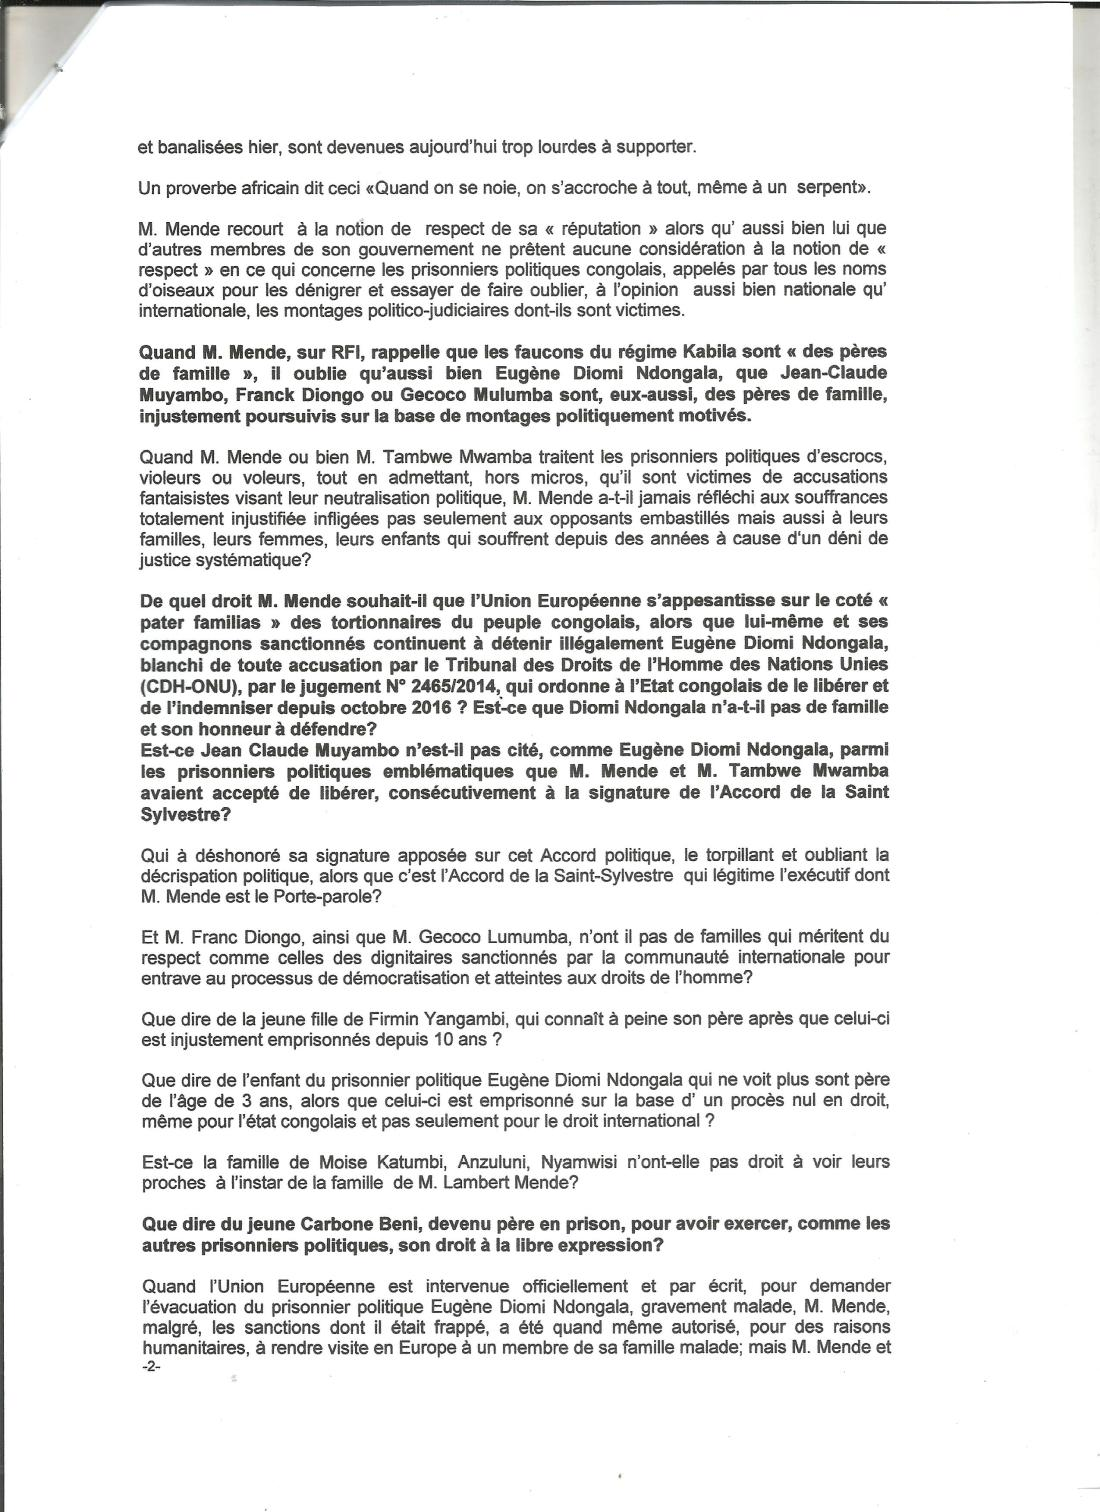 LETTRE A SEM L AMBASSADEUR UE - CFFP 1610180004